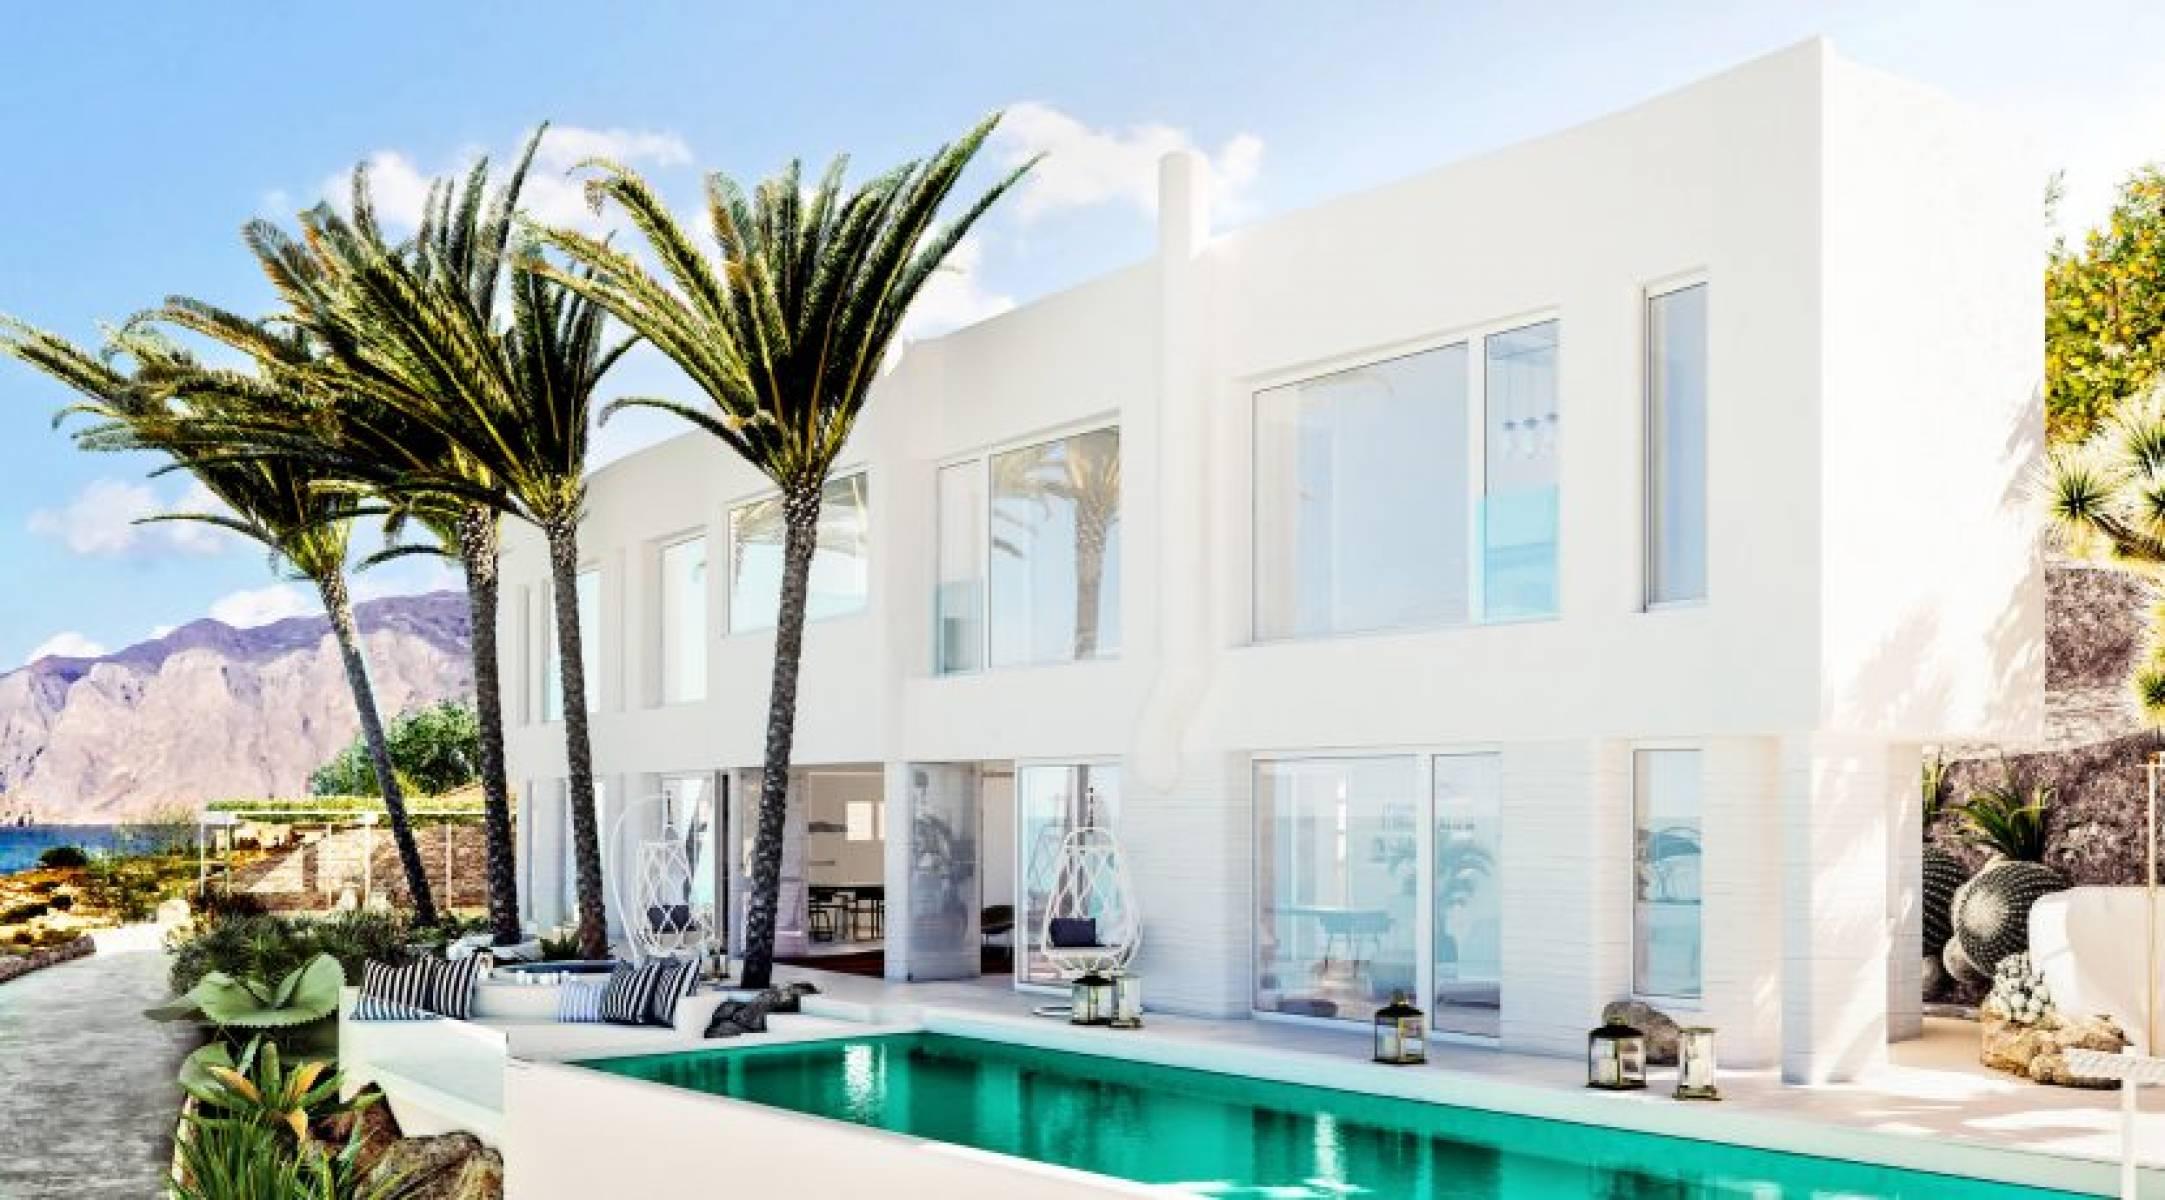 Luxury villa with views of Mirabello bay